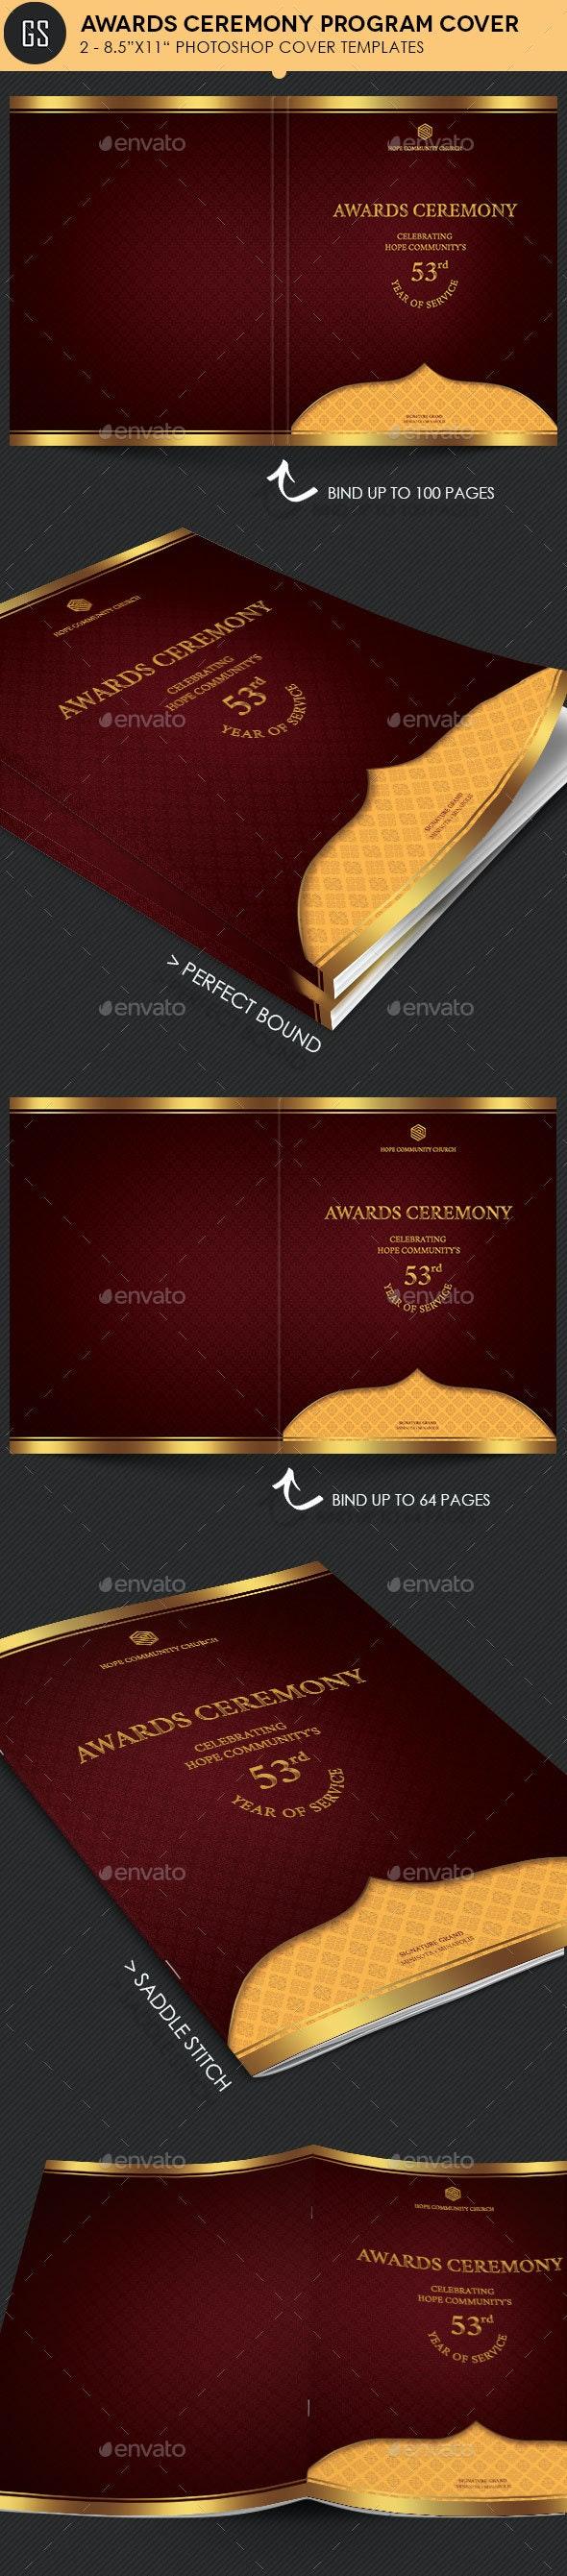 Awards Ceremony Program Cover Template  - Informational Brochures